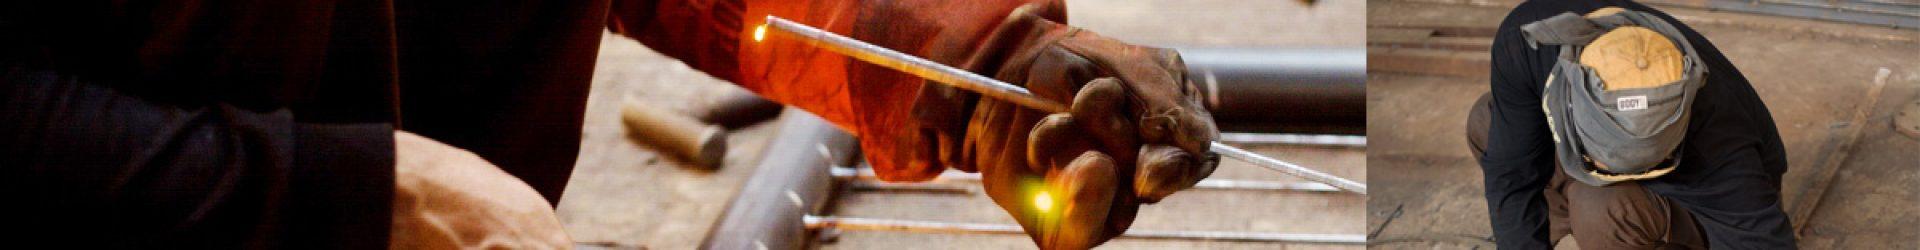 Tag: harga kawat harmonika 2019 2020 di Tulungagung